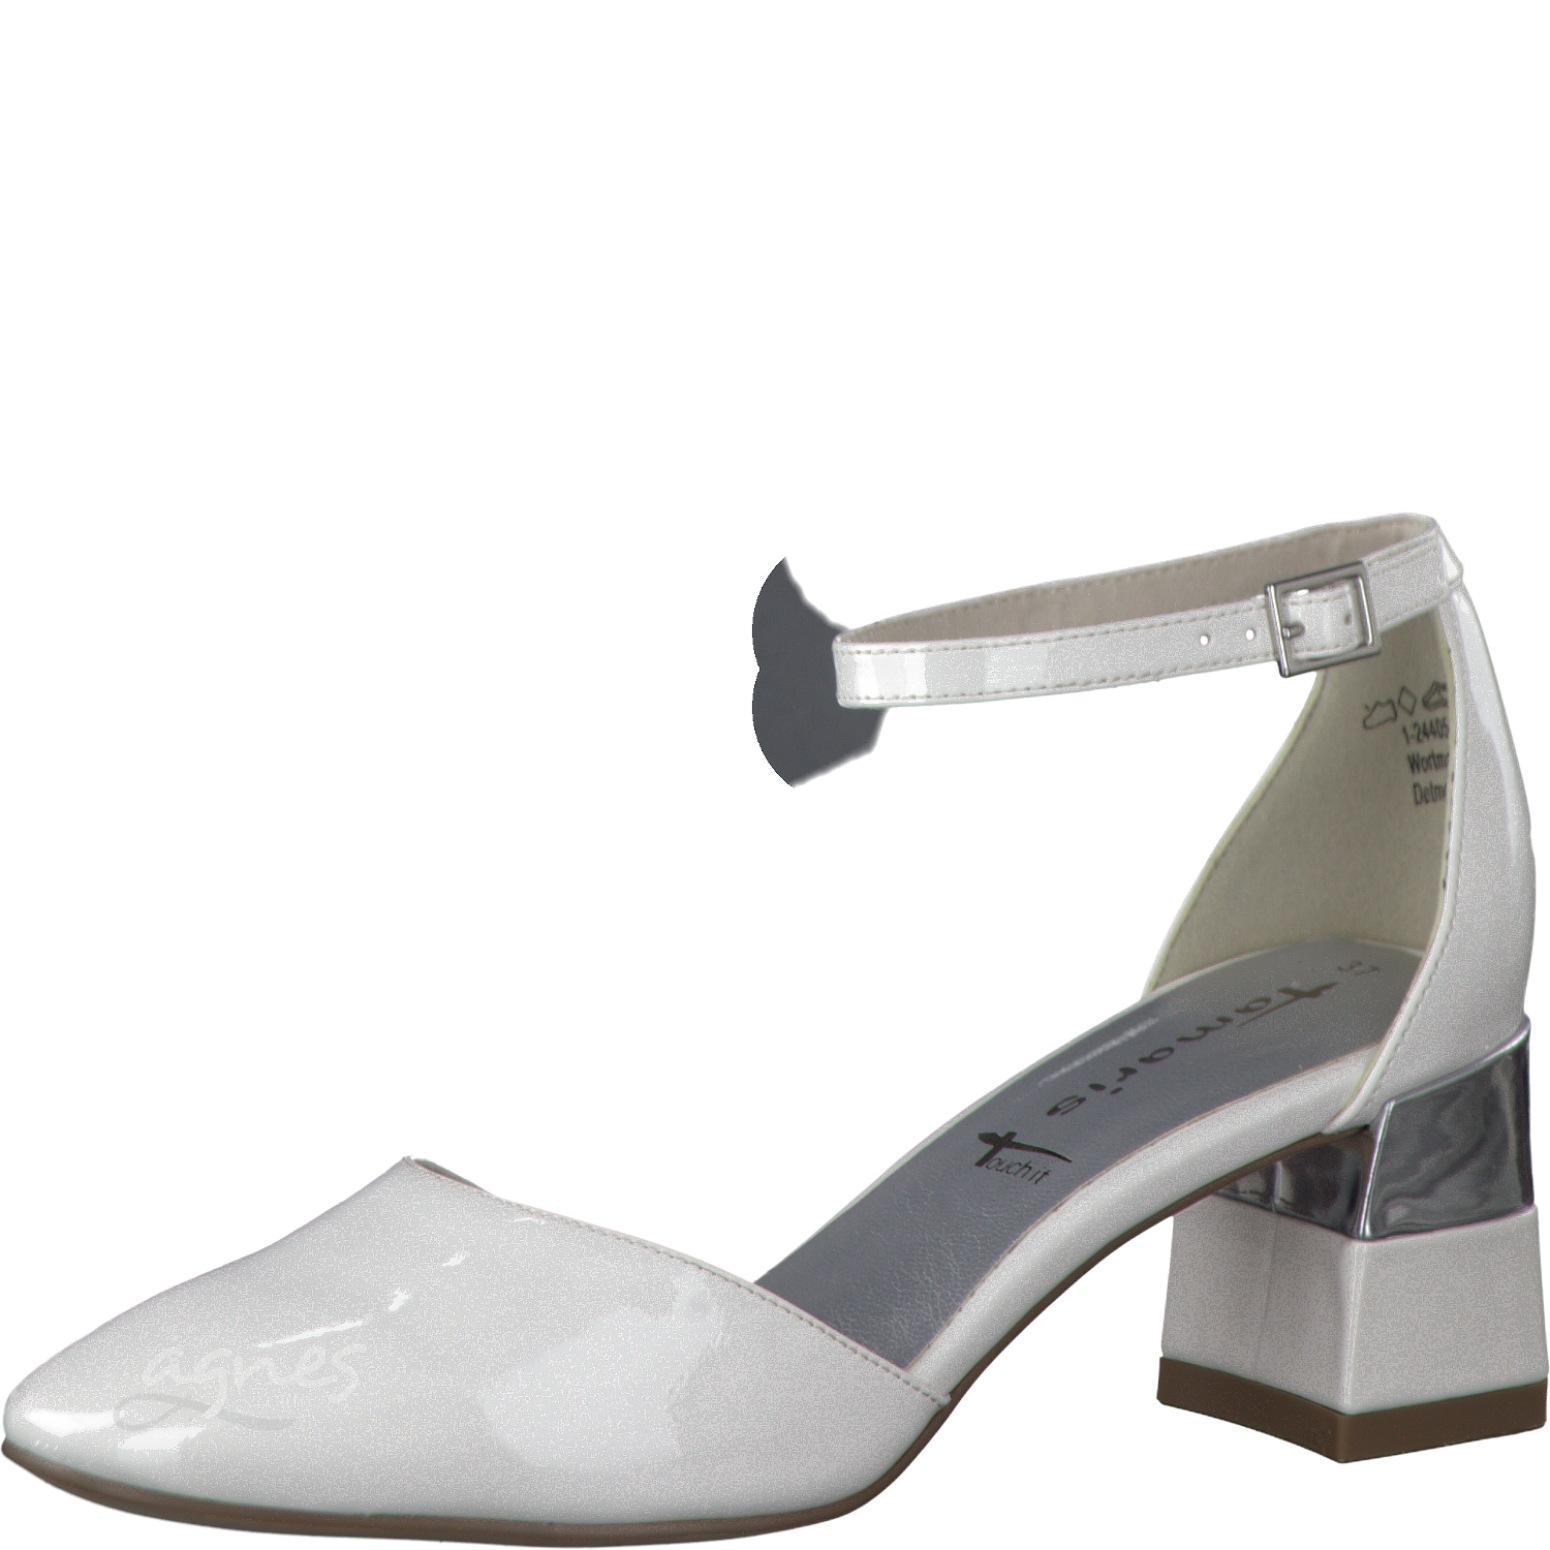 svatebni-obuv-tamaris-24405-studioagnes